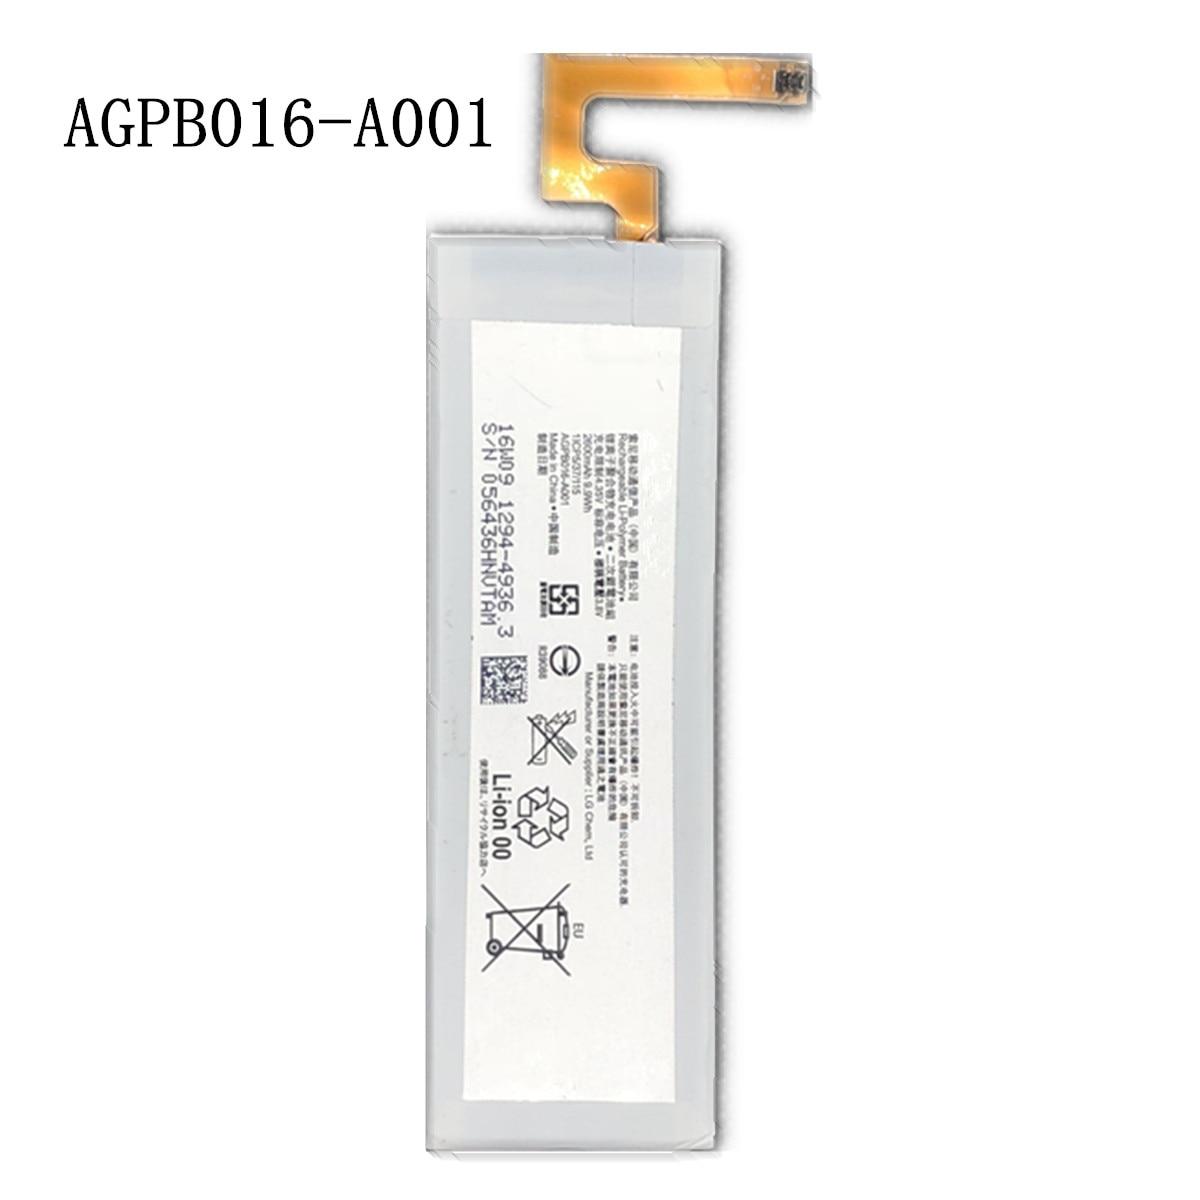 Nowy 2600mAh AGPB016-A001 wymiana baterii do Sony Sony Xperia M5 E5603 E5606 E5653 E5633 E5643 E5663 E5603 E5606